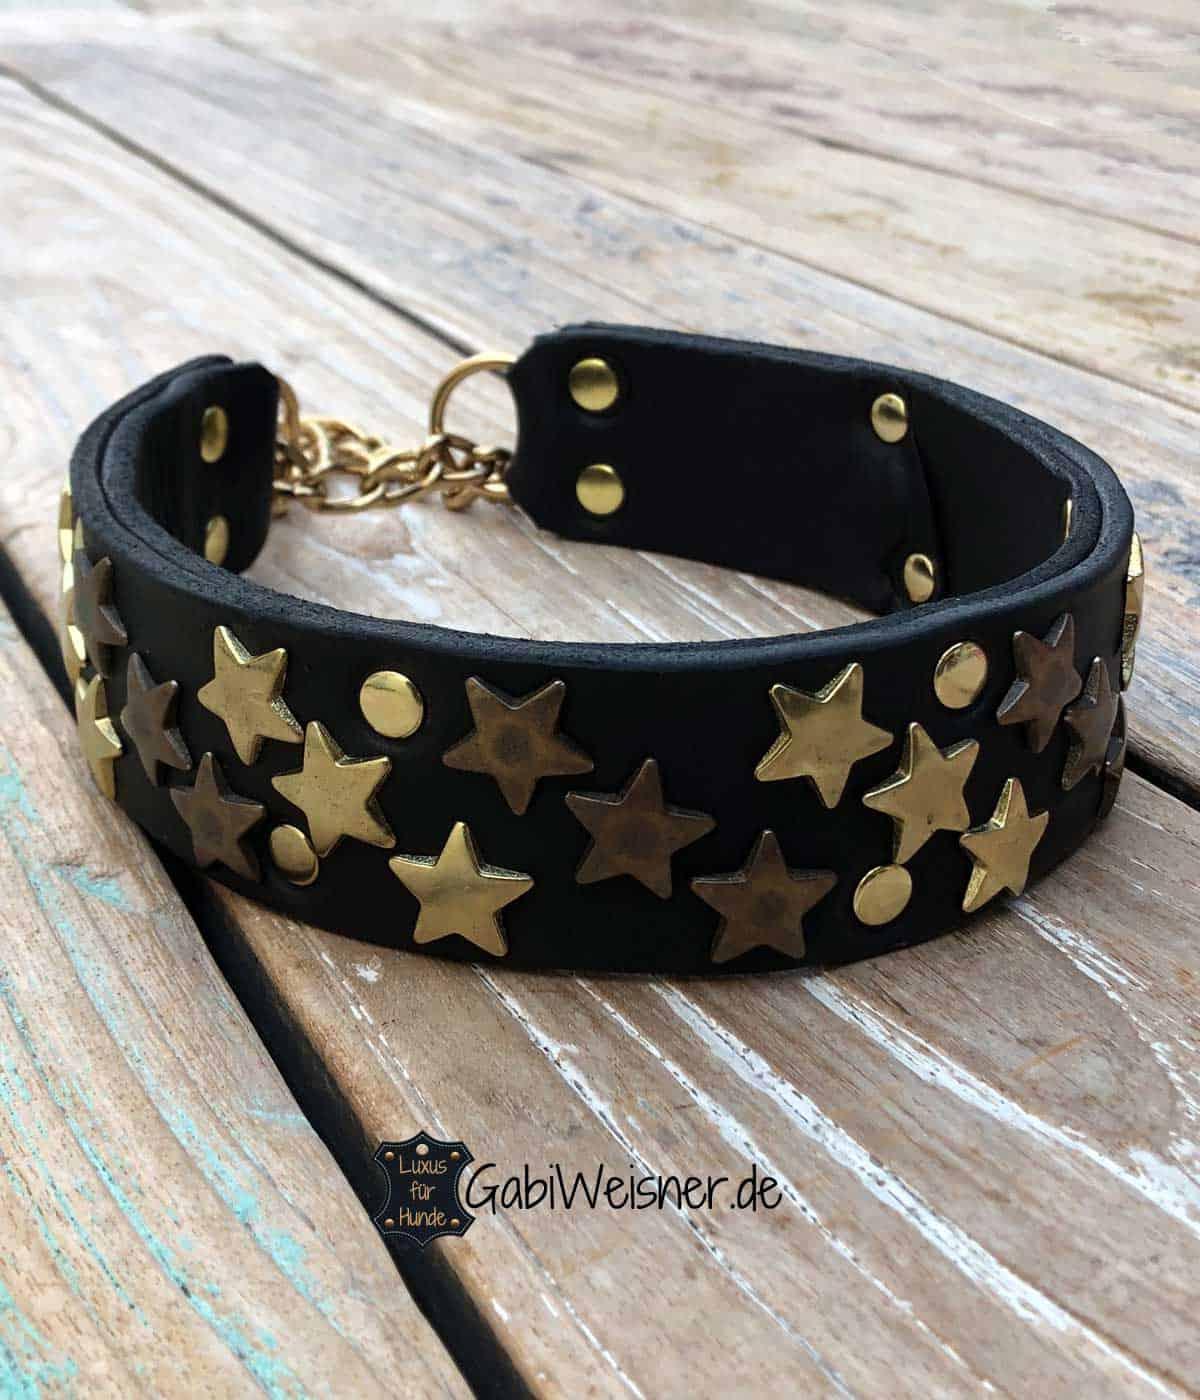 Hundehalsband Leder 4 cm breit. Sterne und Zugstopp in Gold